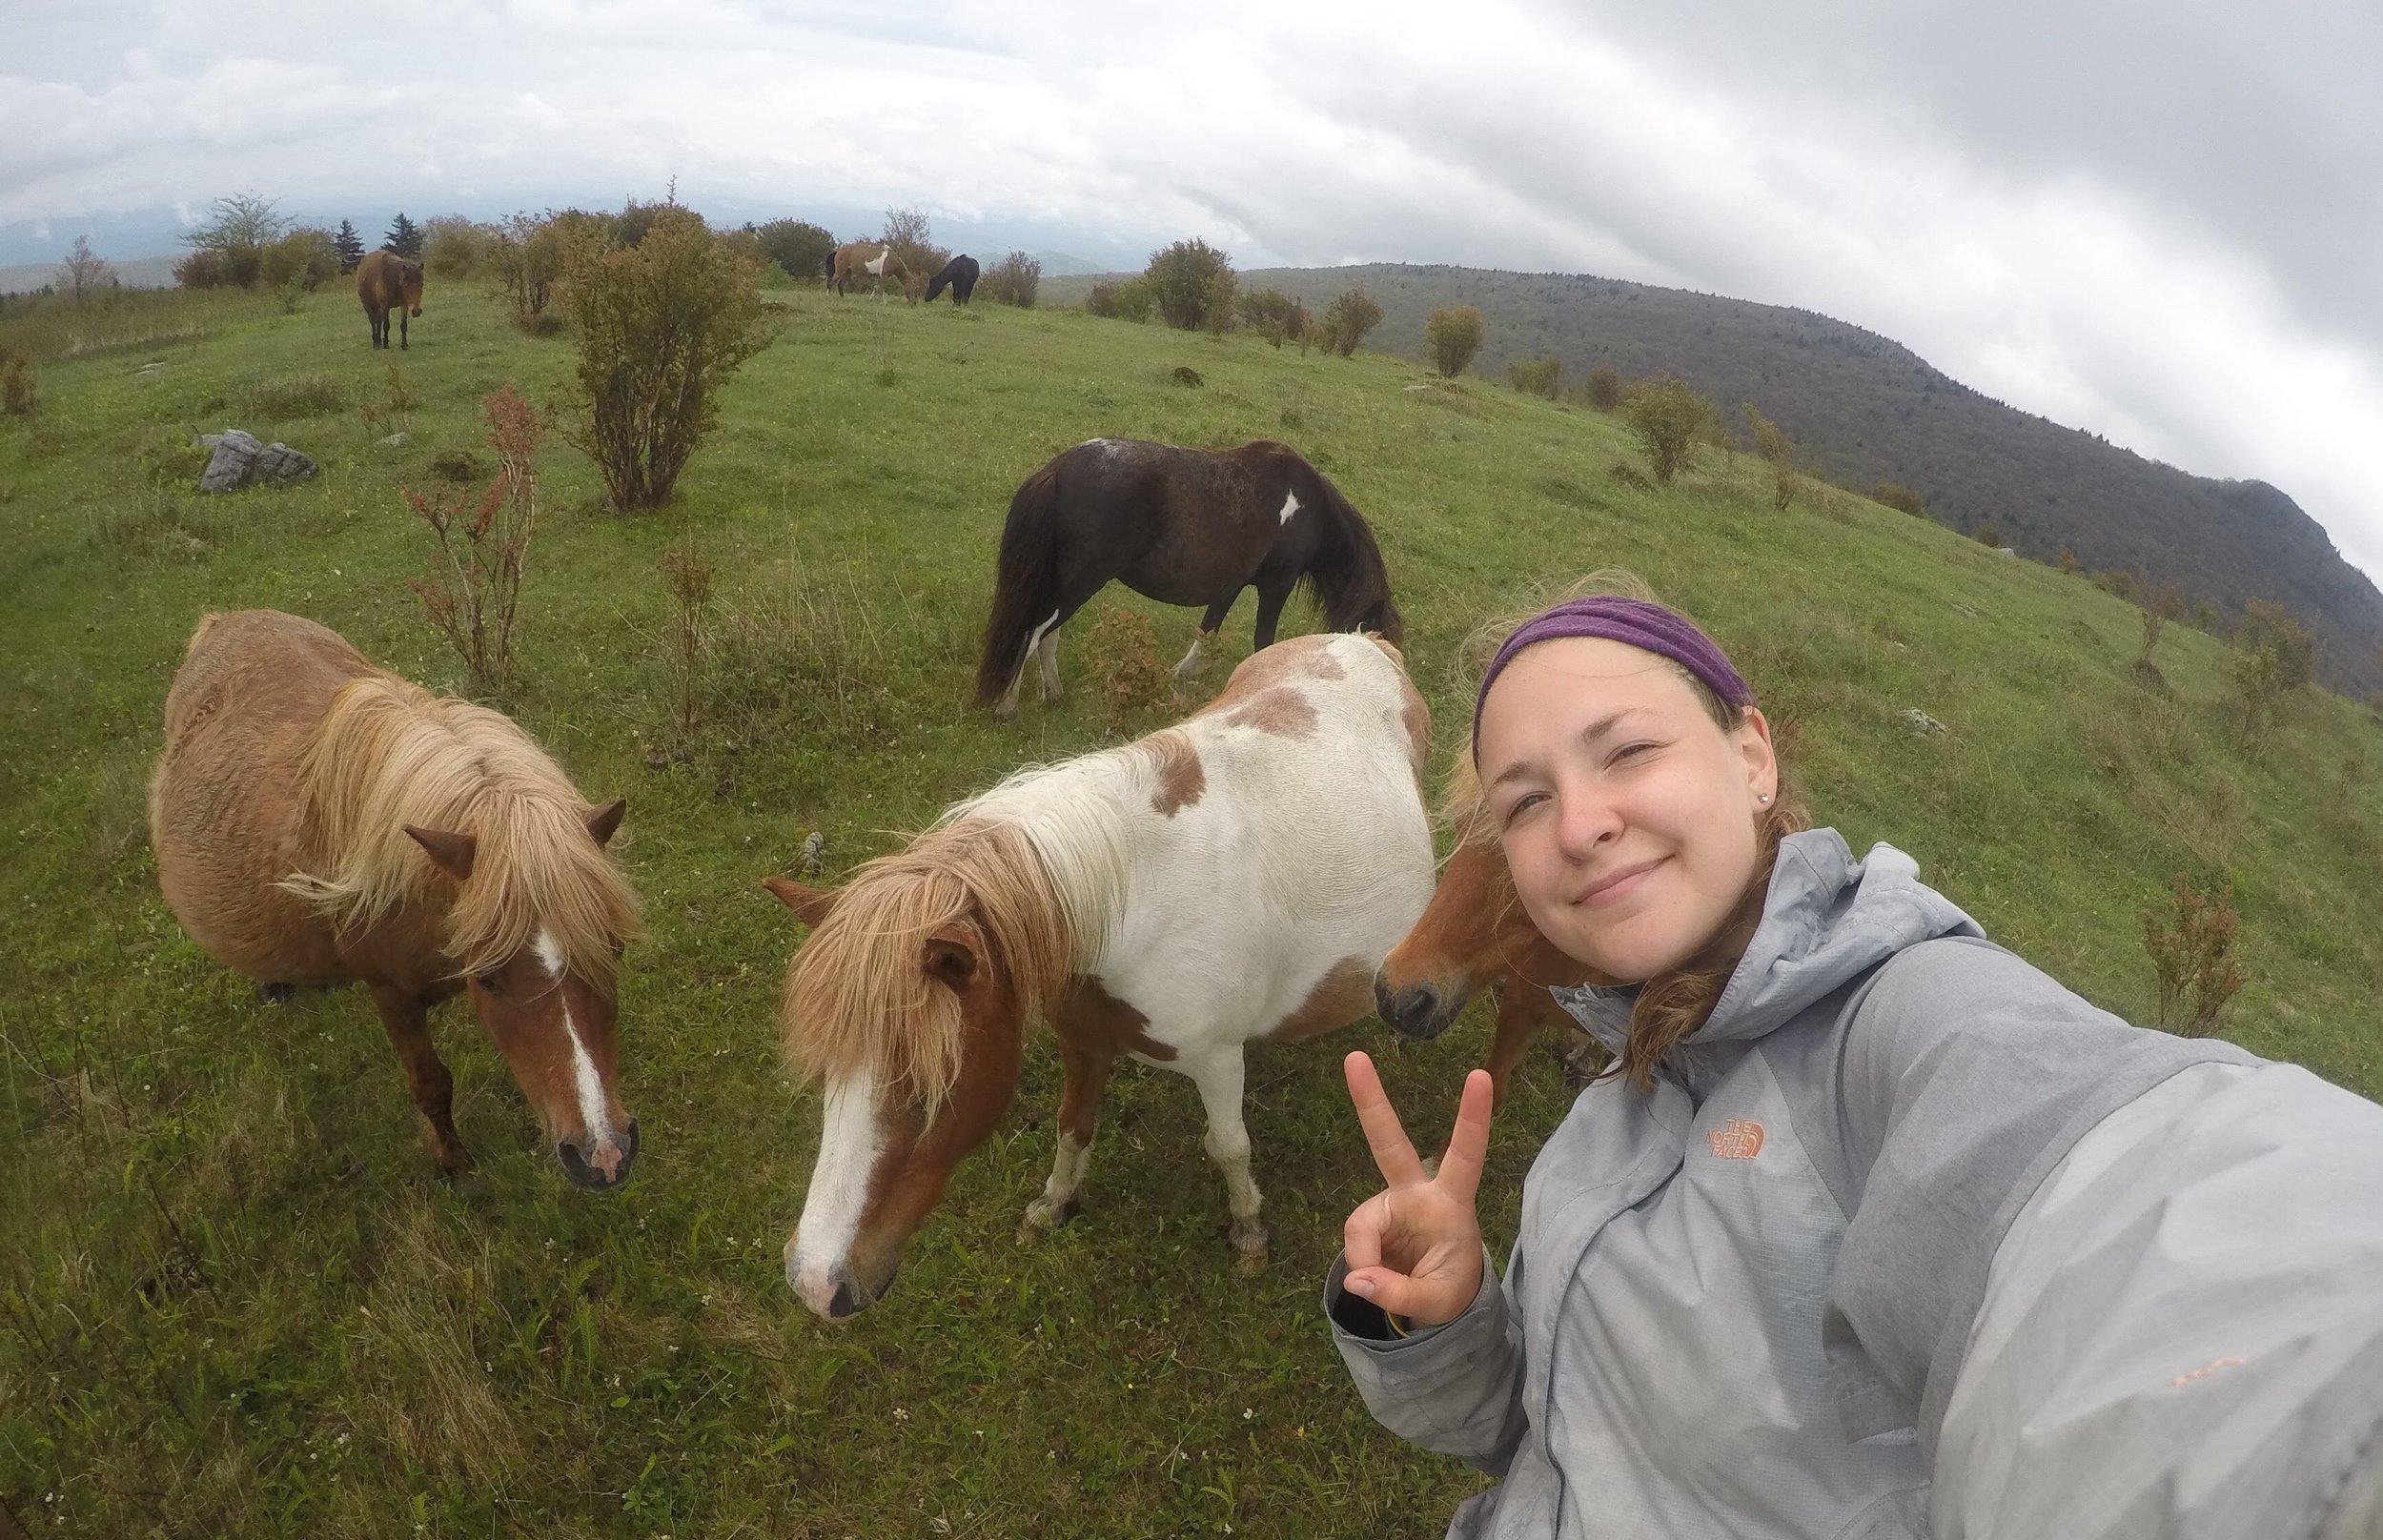 Appalachian Trail, Grayson Highlands, VA